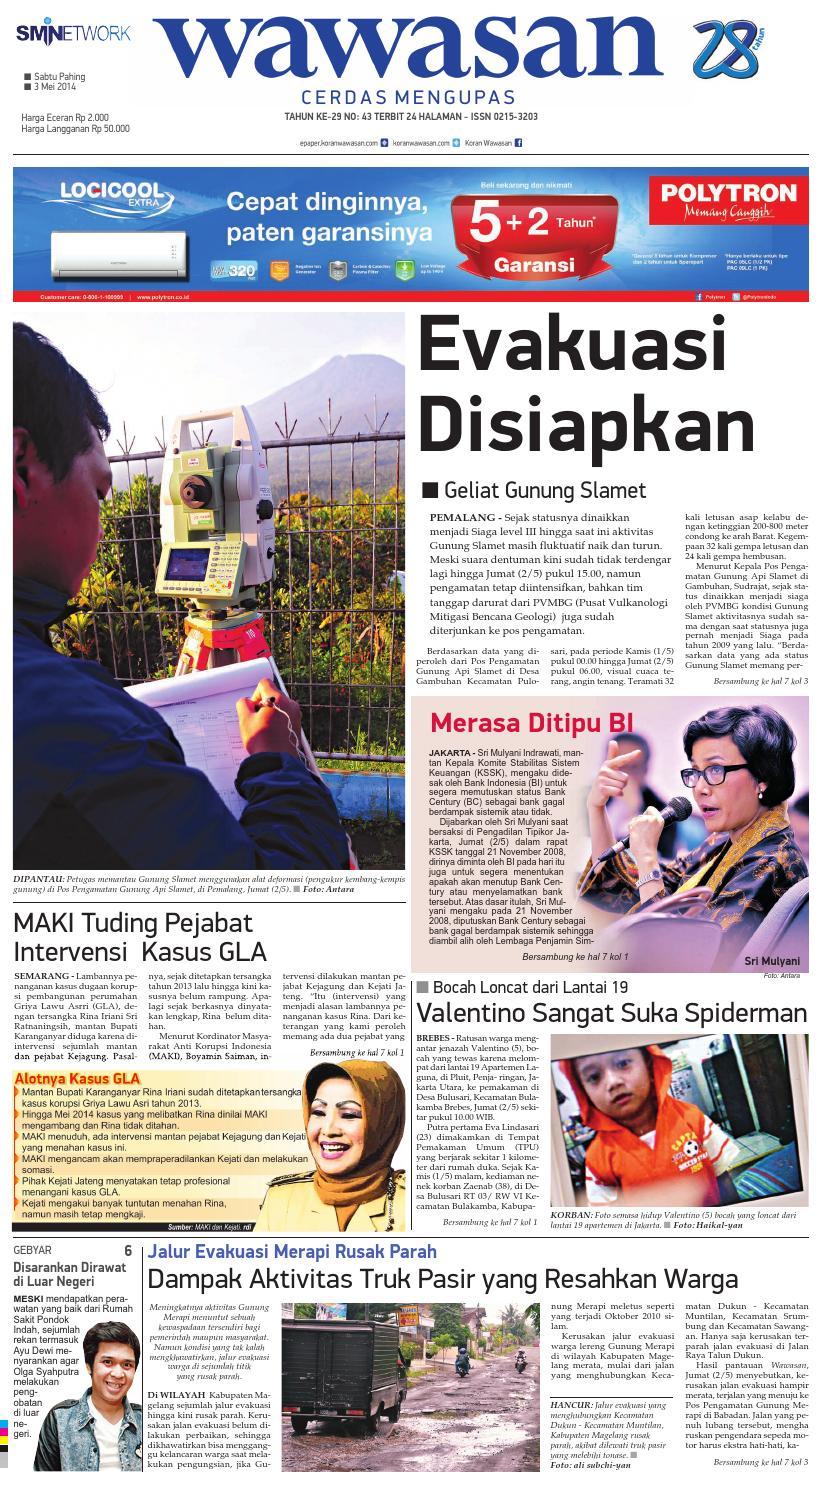 Wawasan 03 Mei 2014 By Koran Pagi Issuu Produk Ukm Bumn Jus Durian Lite Kuning Omah Duren